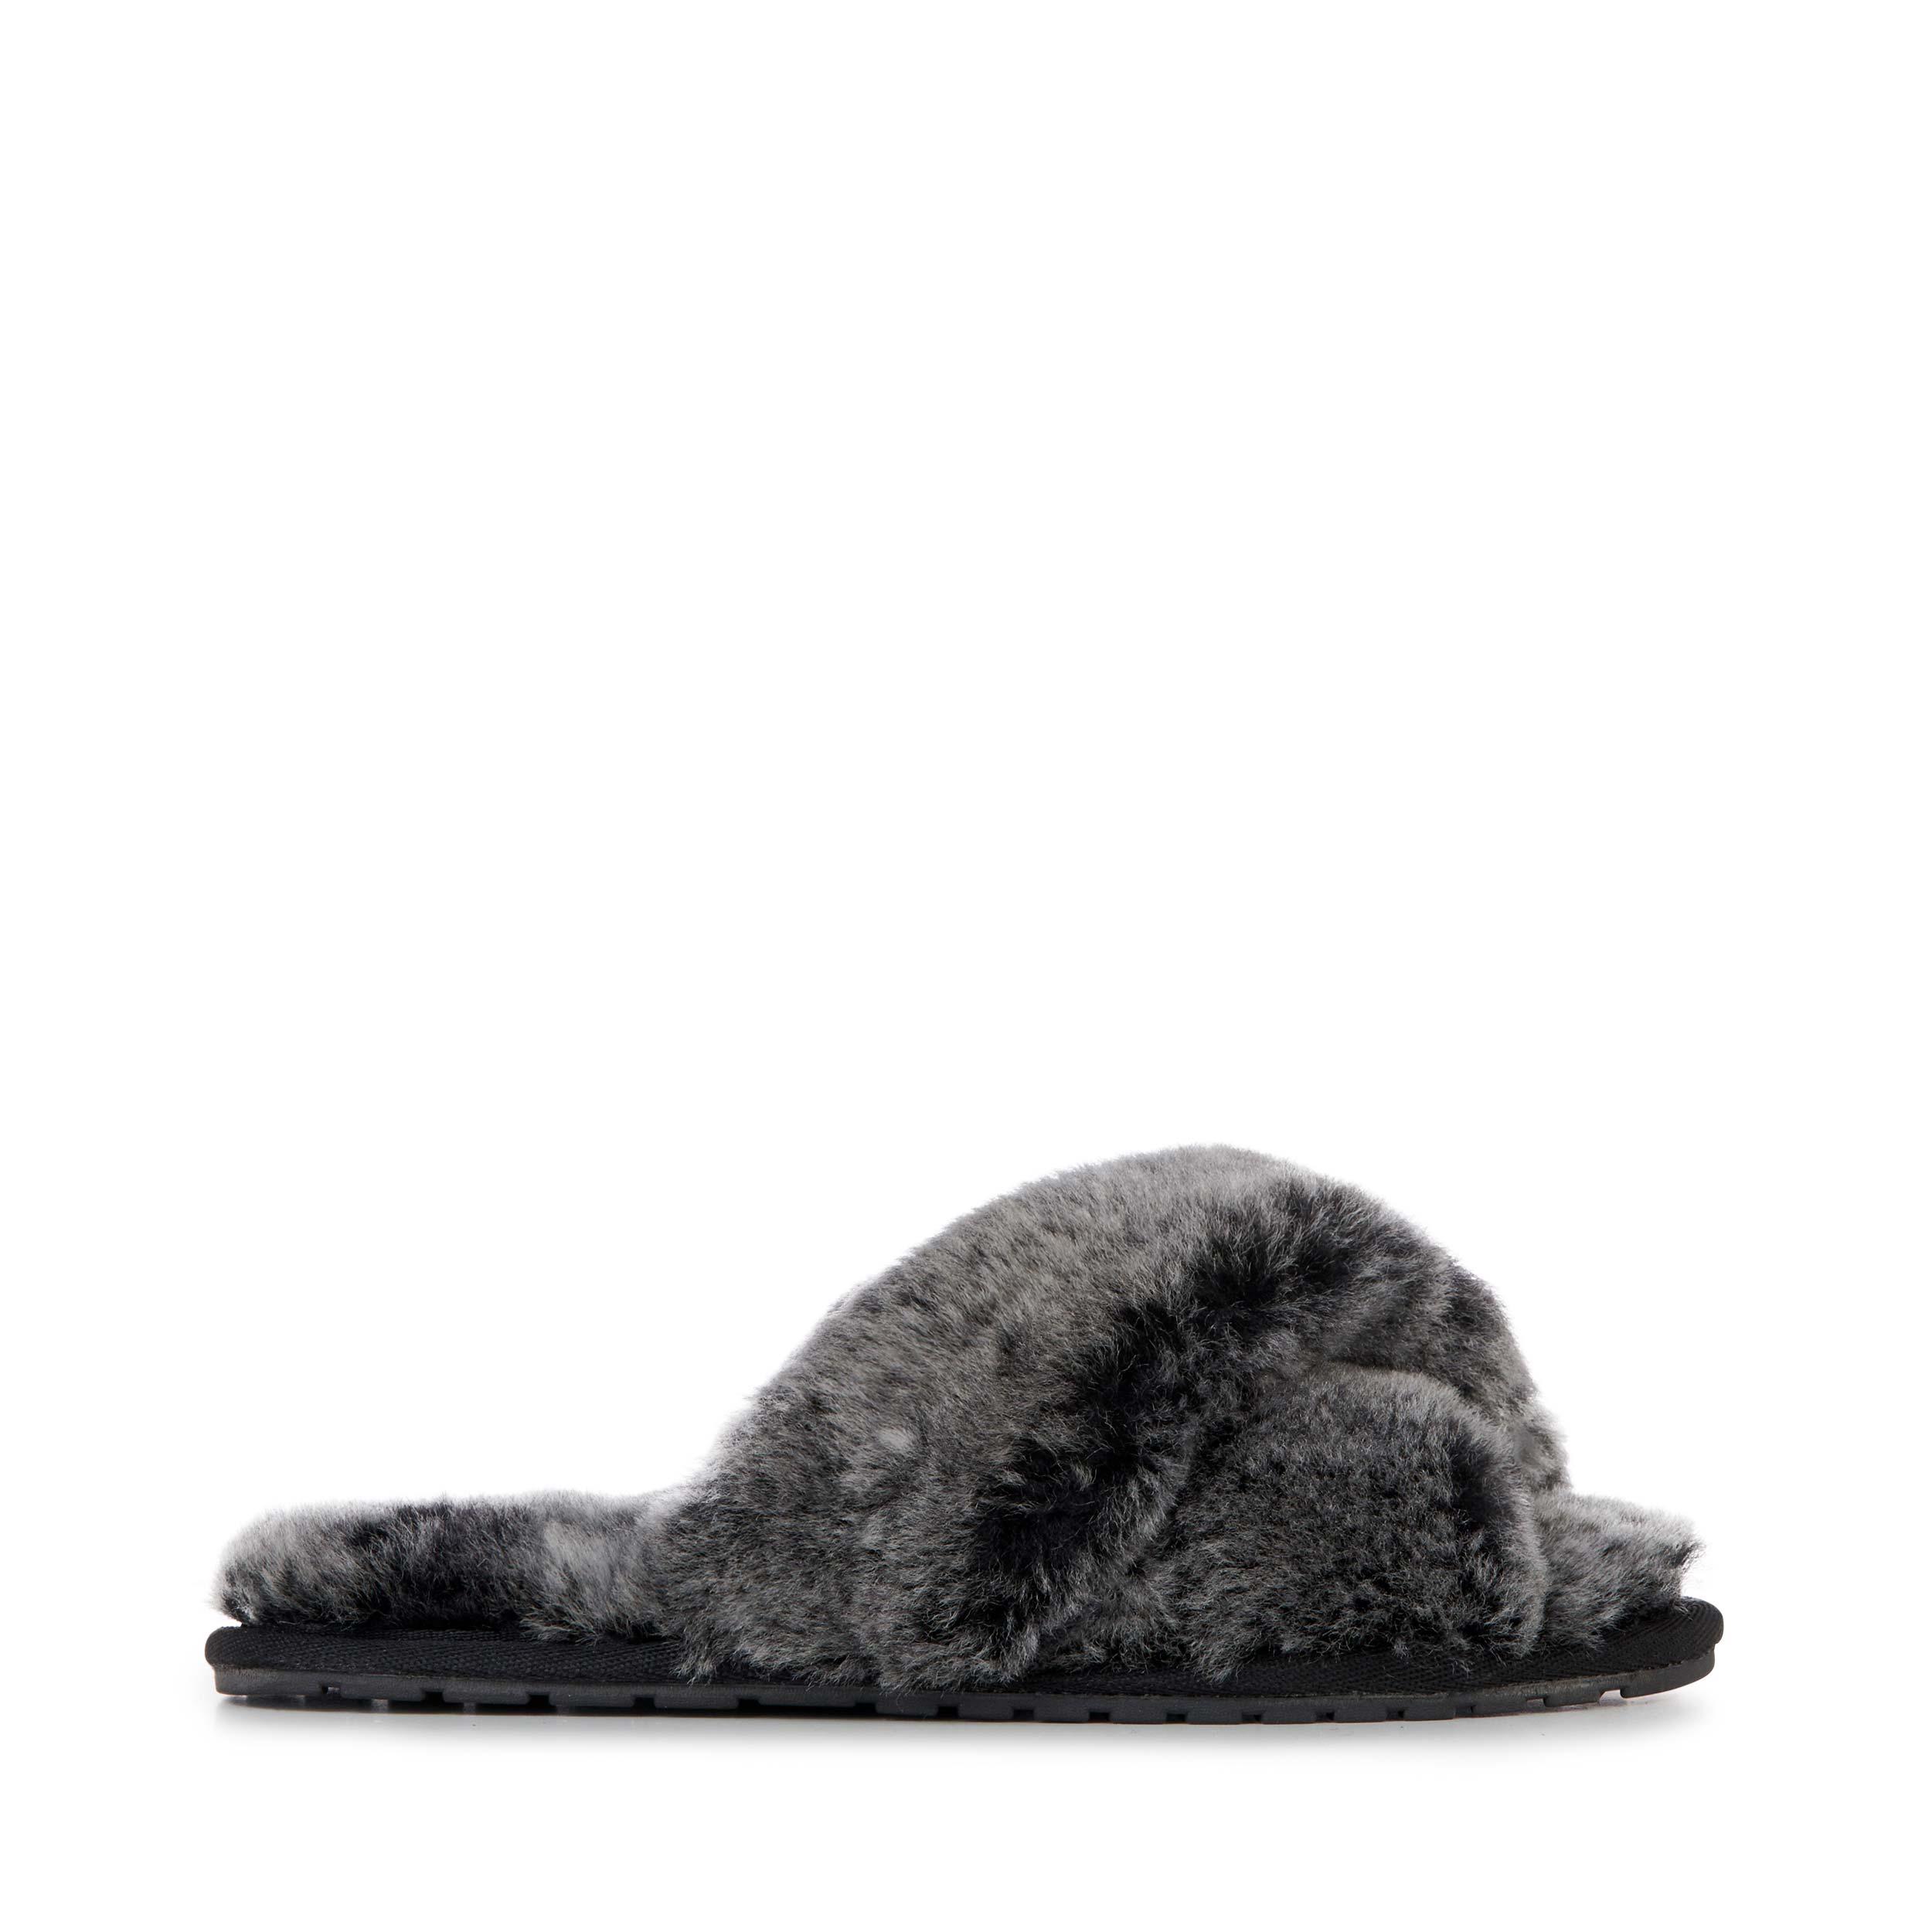 Emu Australia Mayberry Slippers in Black Frost